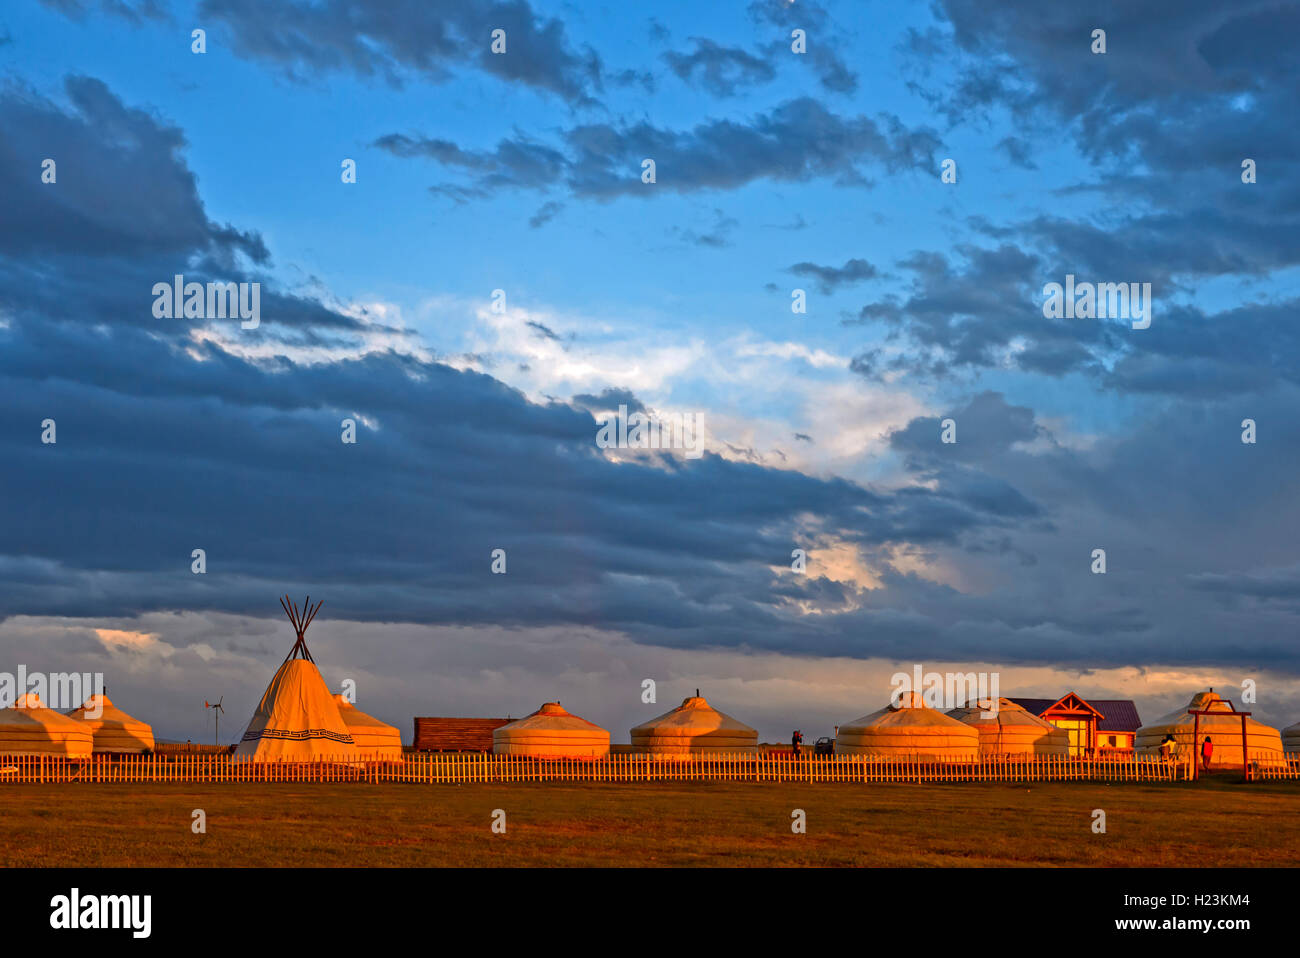 Jurten im Khatan Ugii Tourist Camp Lager zum Sonnenuntergang am Ogii Nuur See, Mongolei - Stock Image